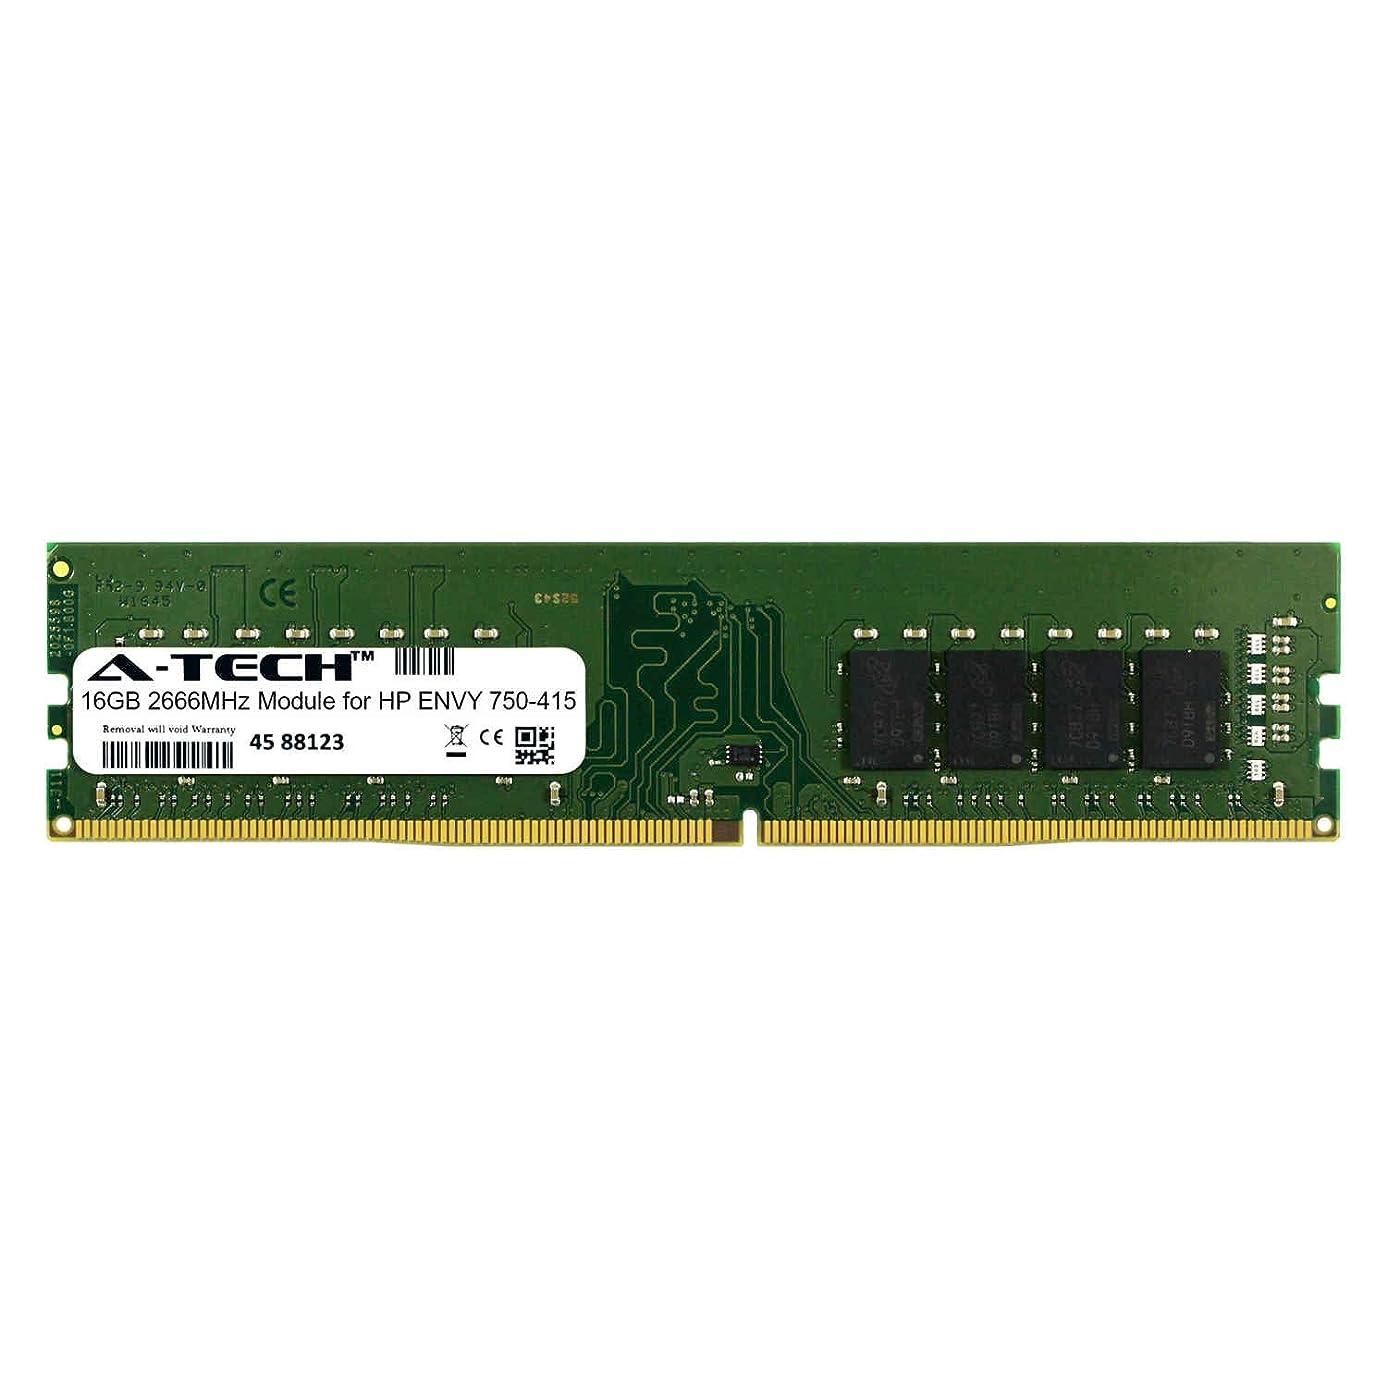 A-Tech 16GB Module for HP Envy 750-415 Desktop & Workstation Motherboard Compatible DDR4 2666Mhz Memory Ram (ATMS274071A25823X1)